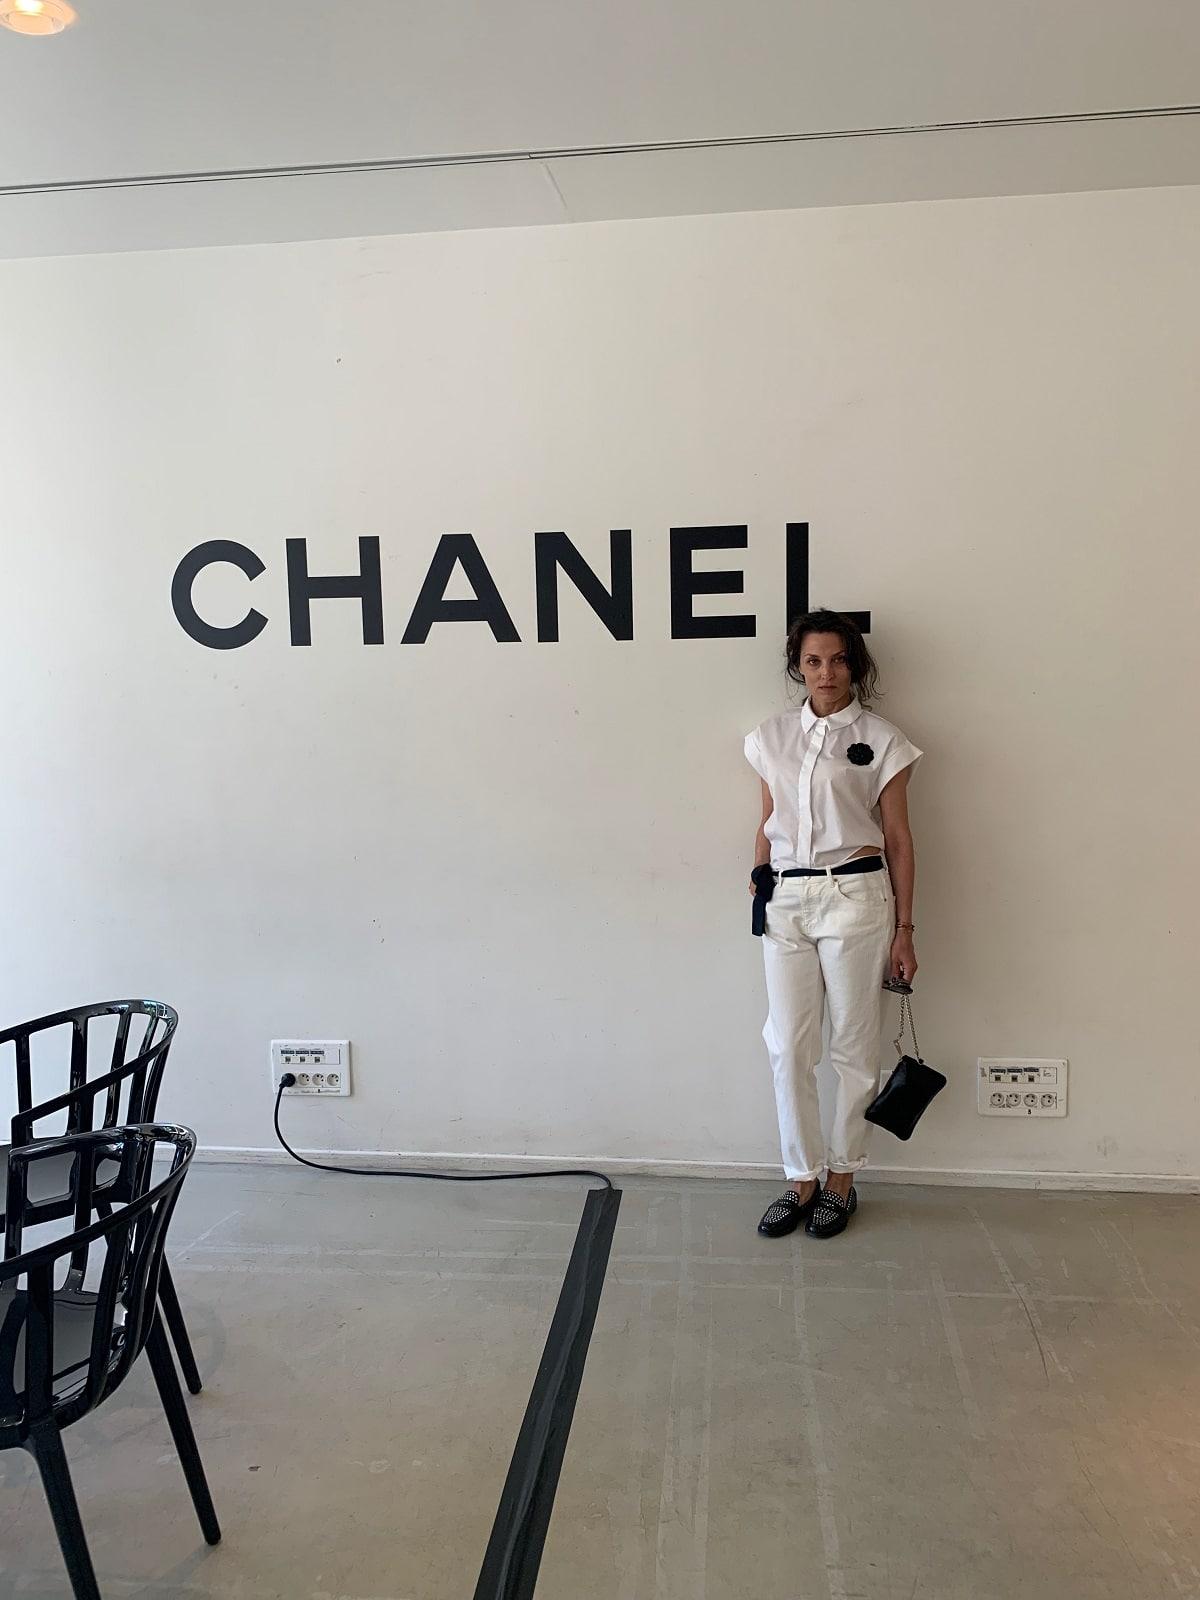 6_CHanel loundge (1)